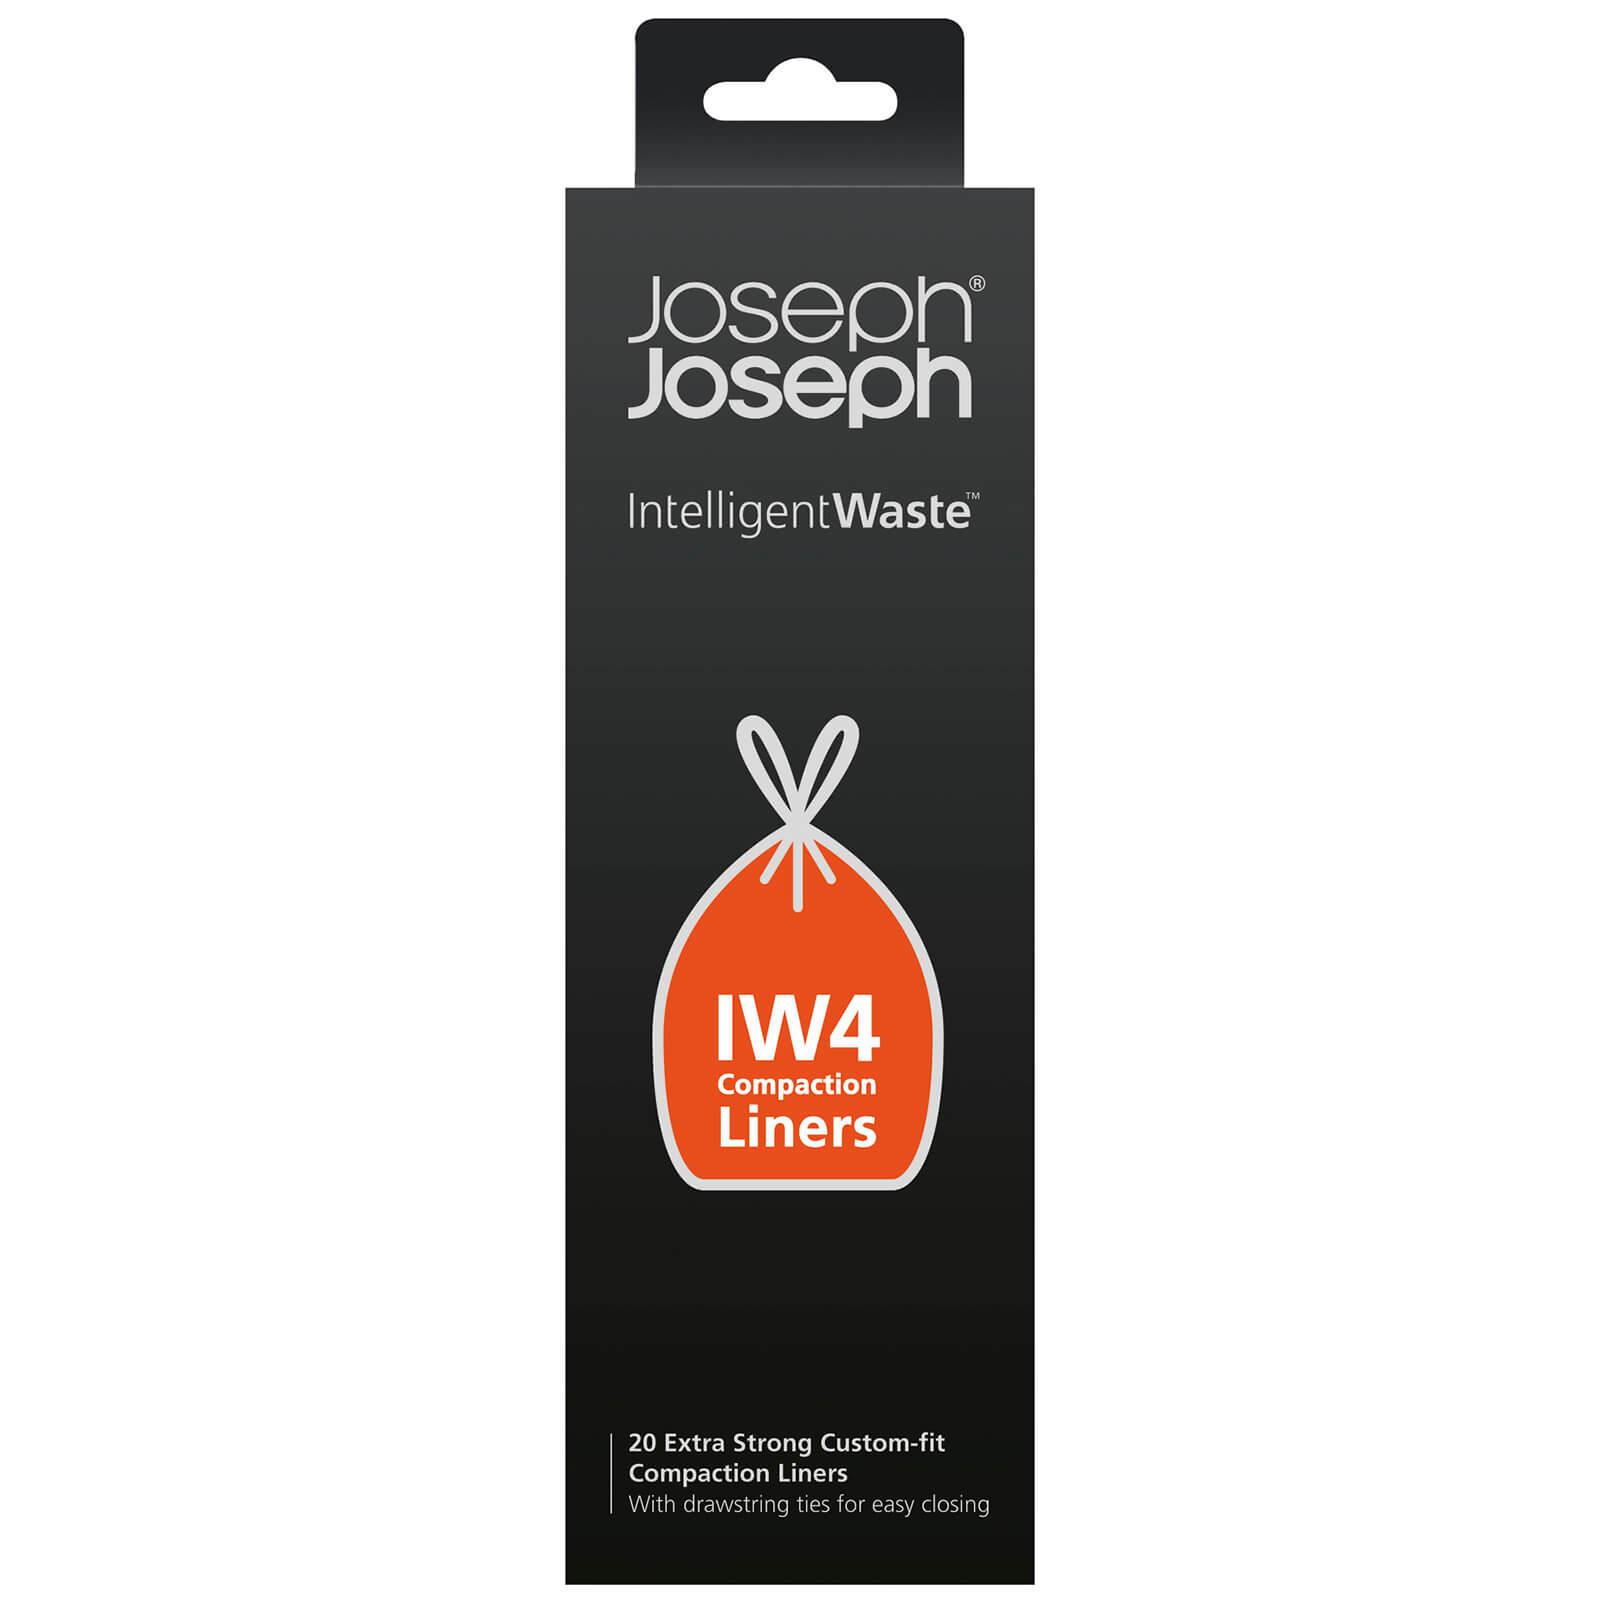 Joseph Joseph Titan Custom Fit Compaction Bin Liners